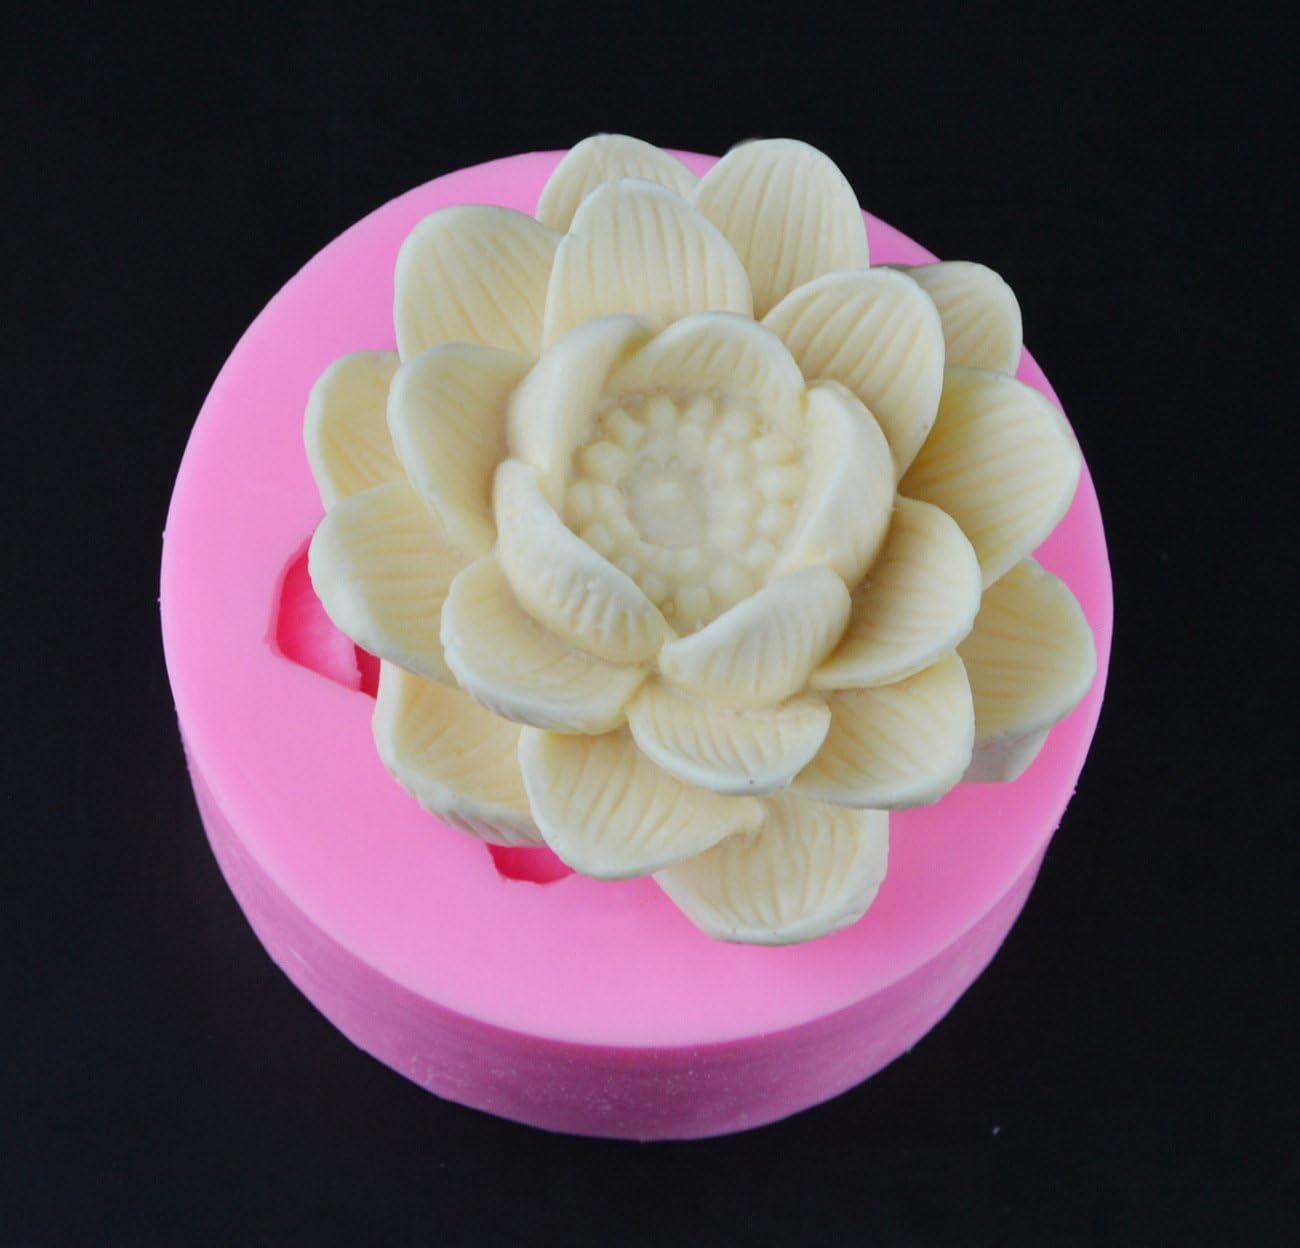 DIY Flower Silicone Fondant Cake Mold Chocolate Decorating Baking Mould Tool